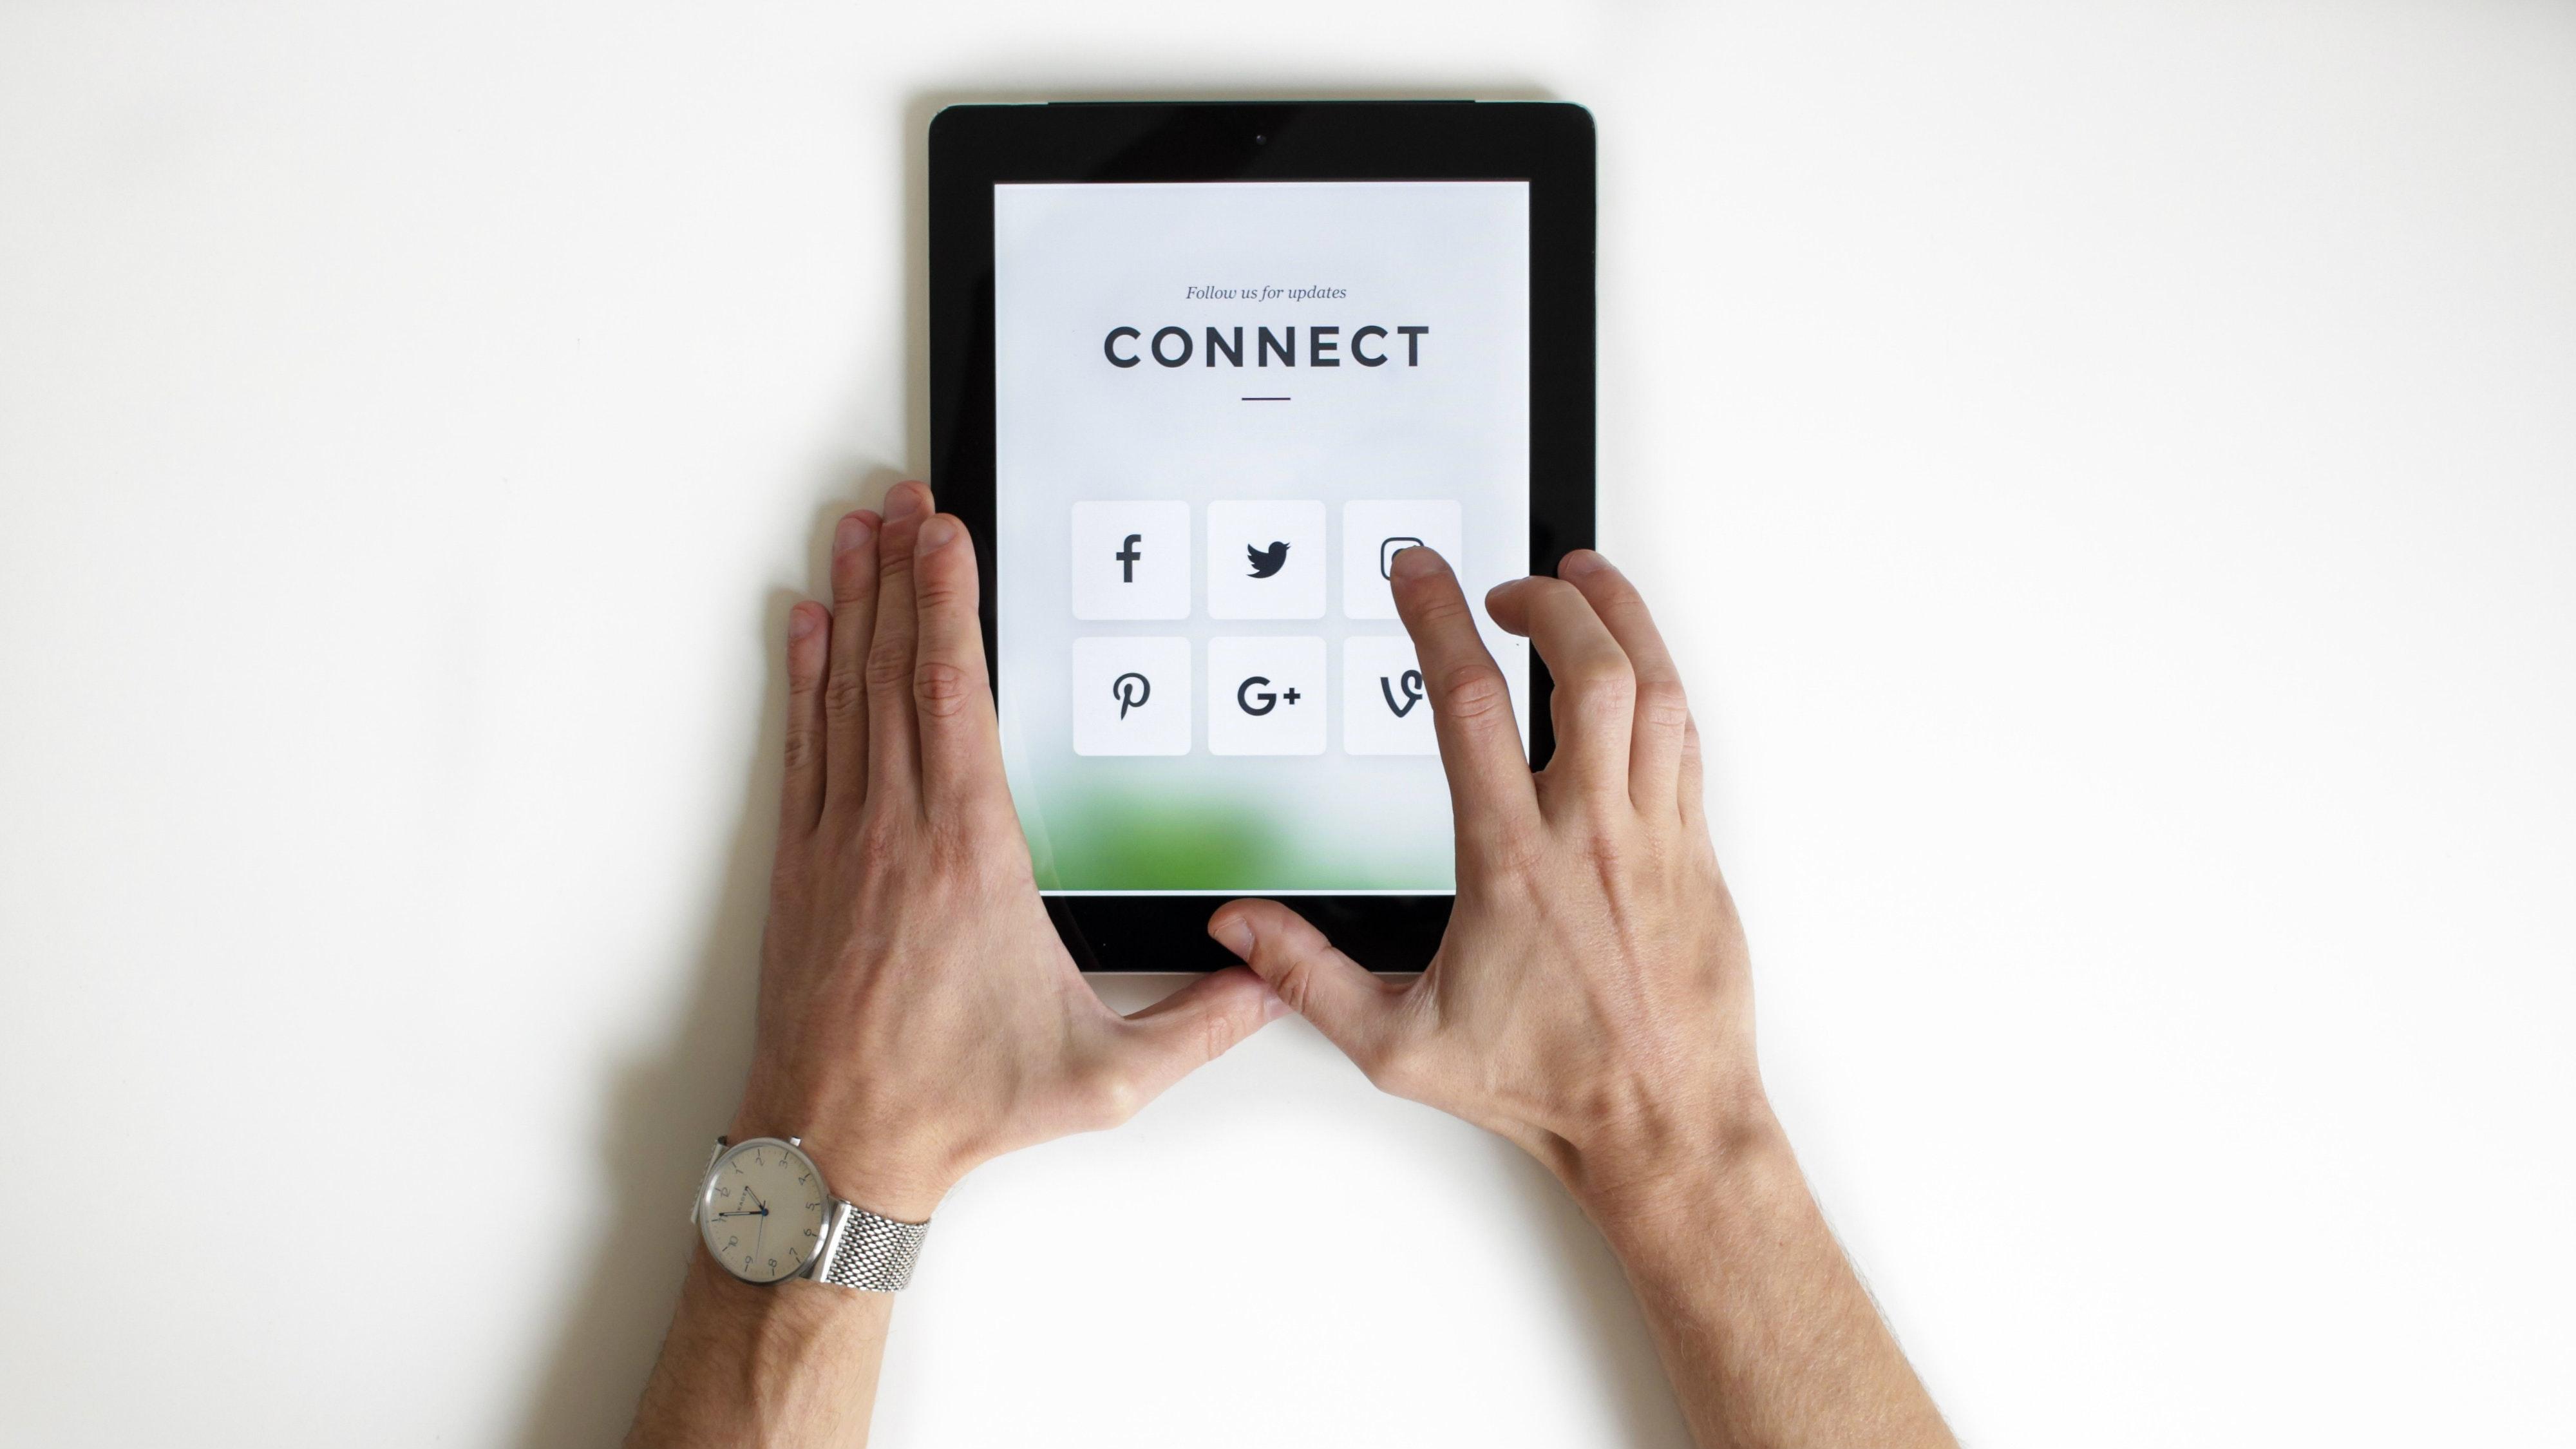 Why We Should Escape Social Media